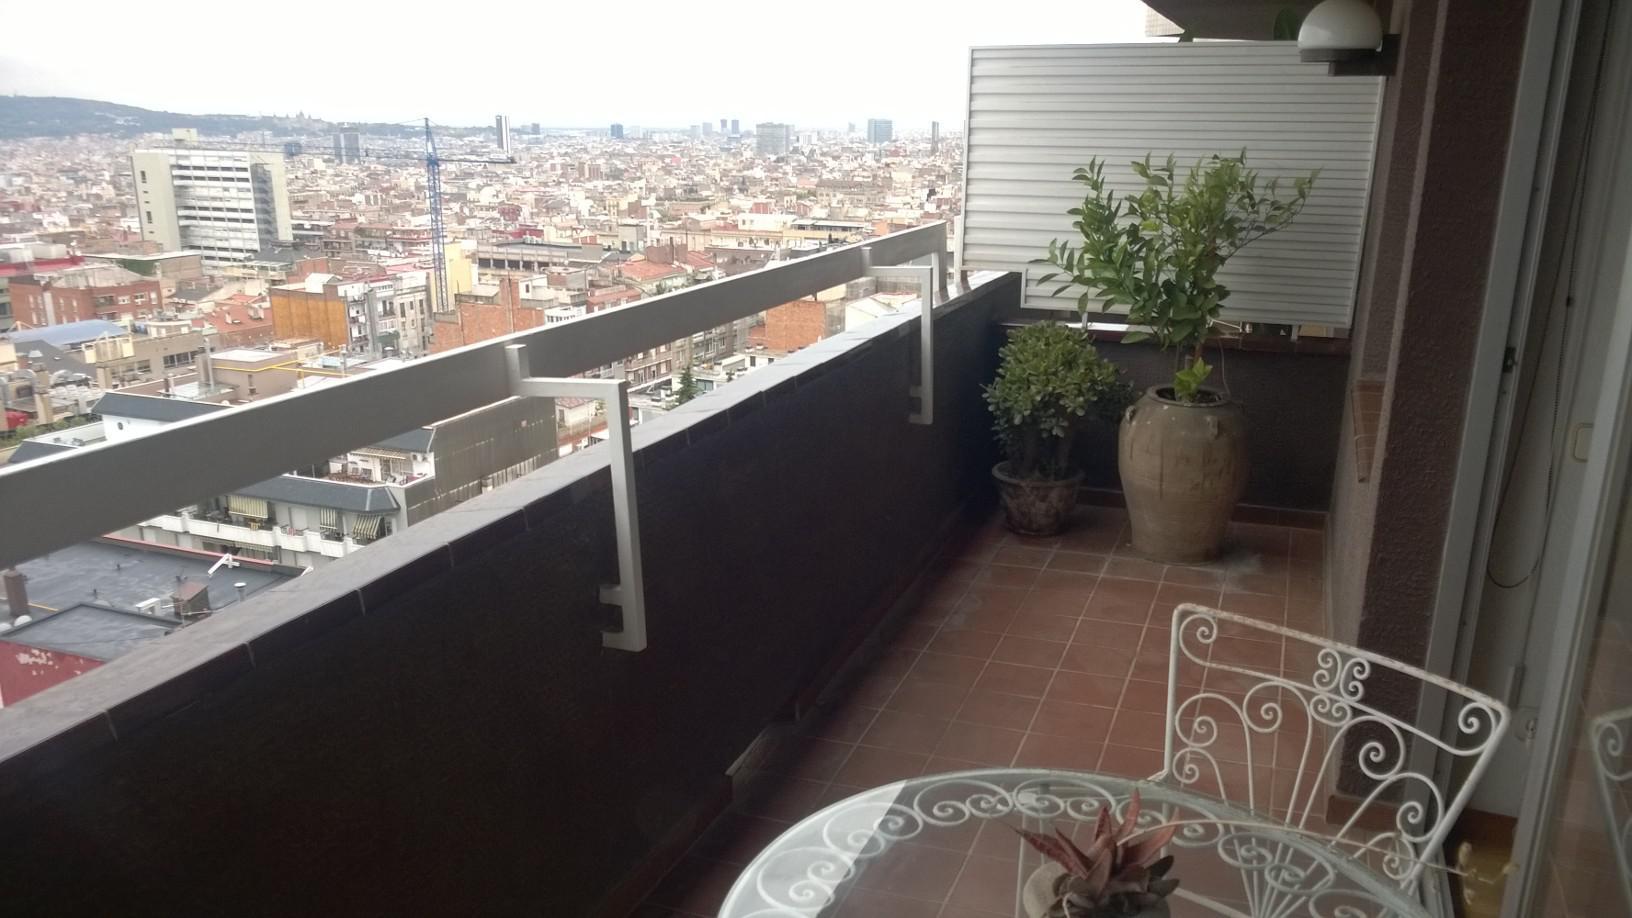 balcon-piso-en-venta-en-junto-calle-camelias-gracia-nova-en-barcelona-210269657